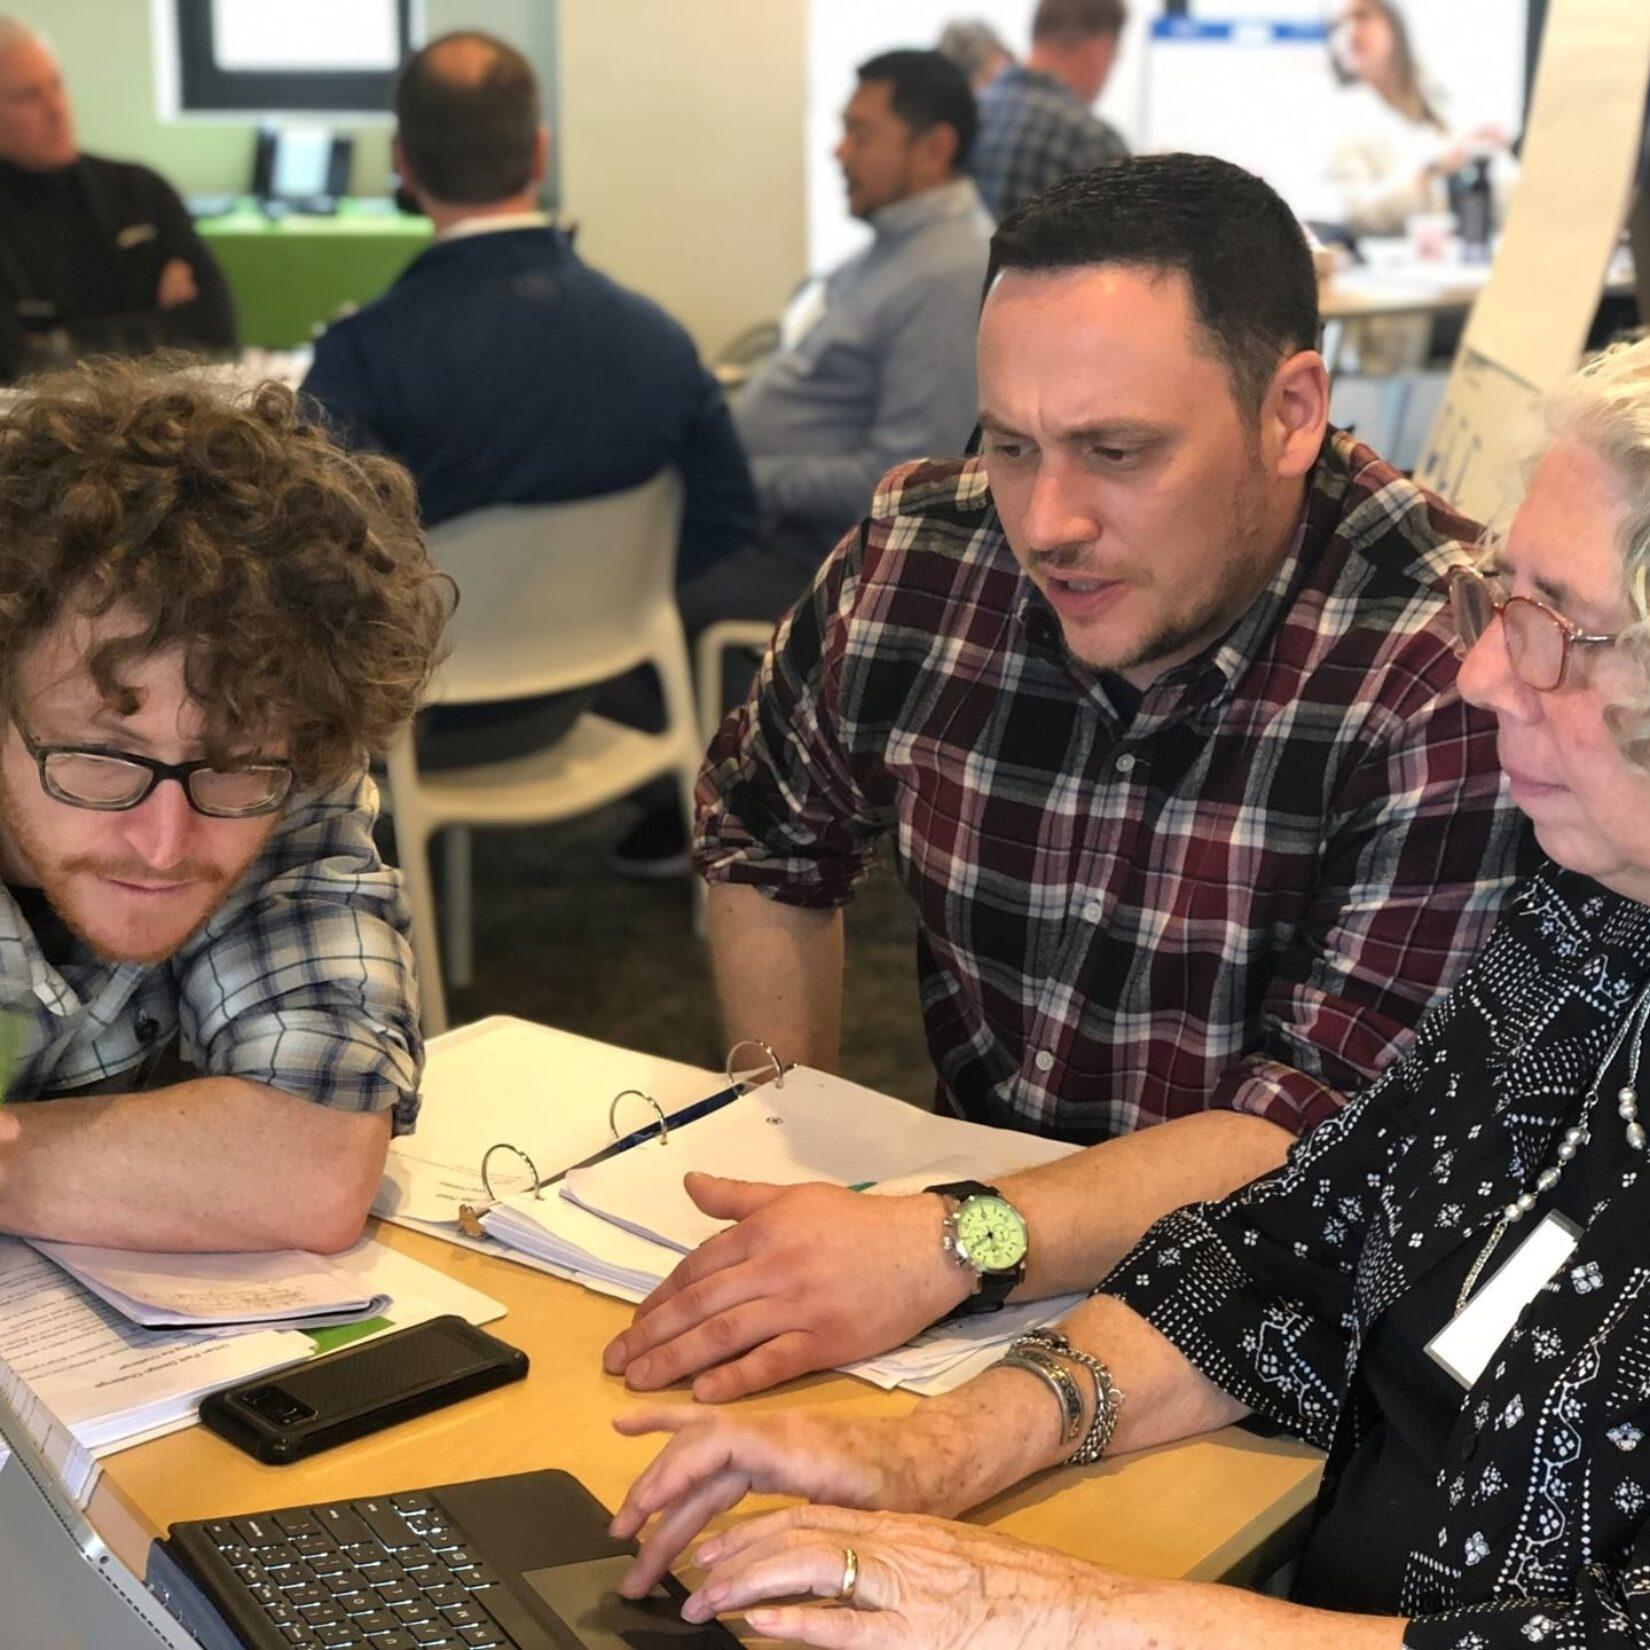 Participants working toward their urban parks management certificate